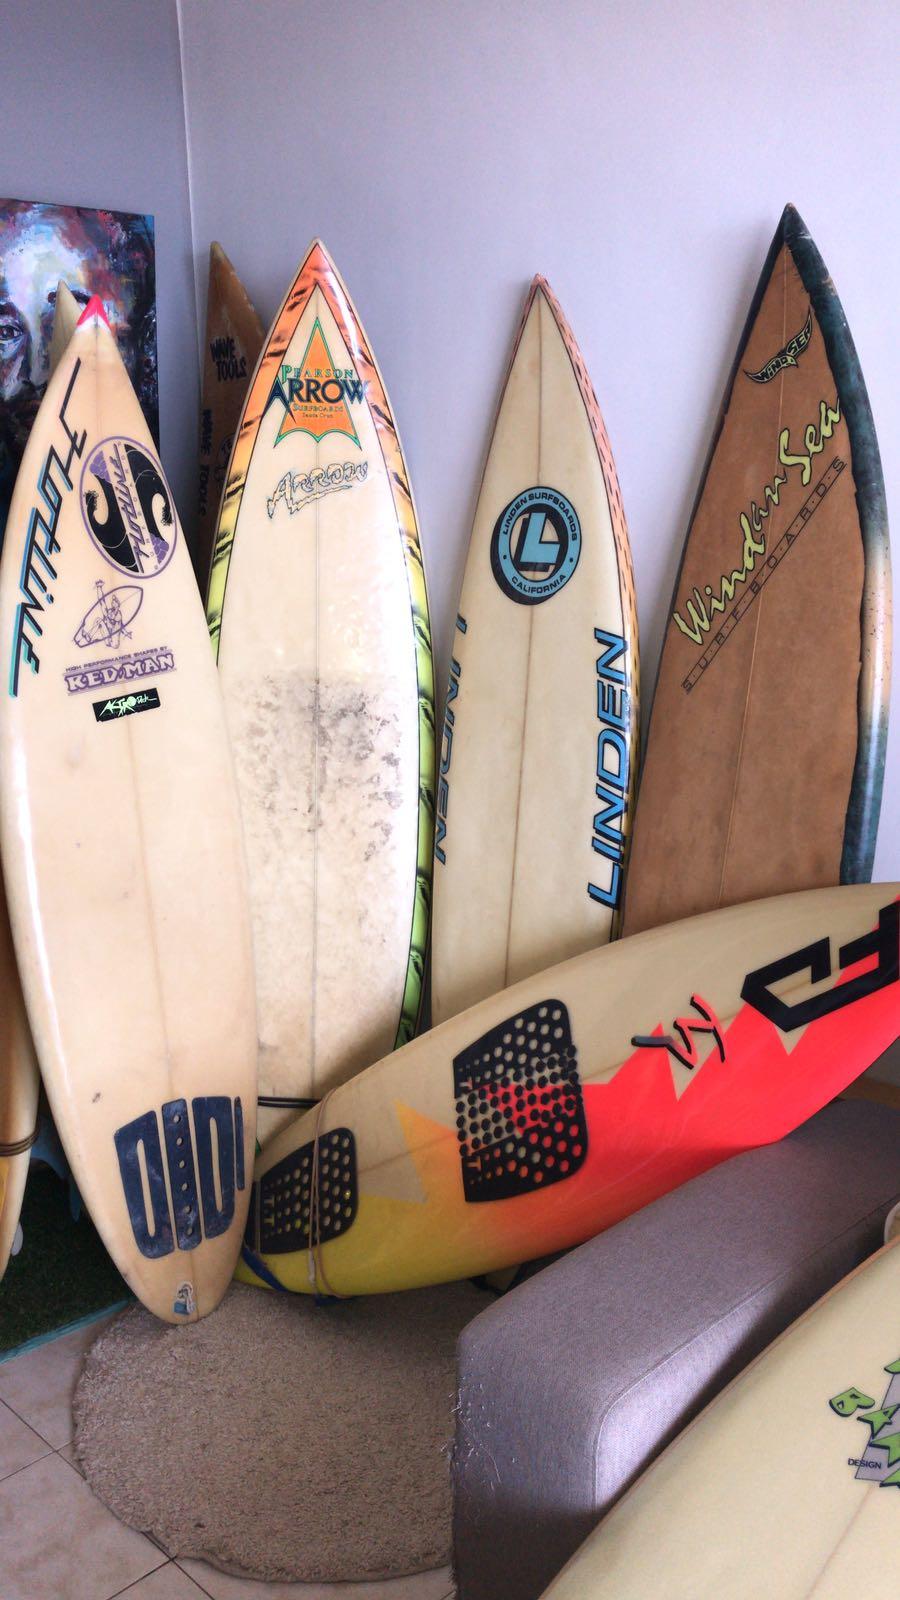 USA vintage surfboards